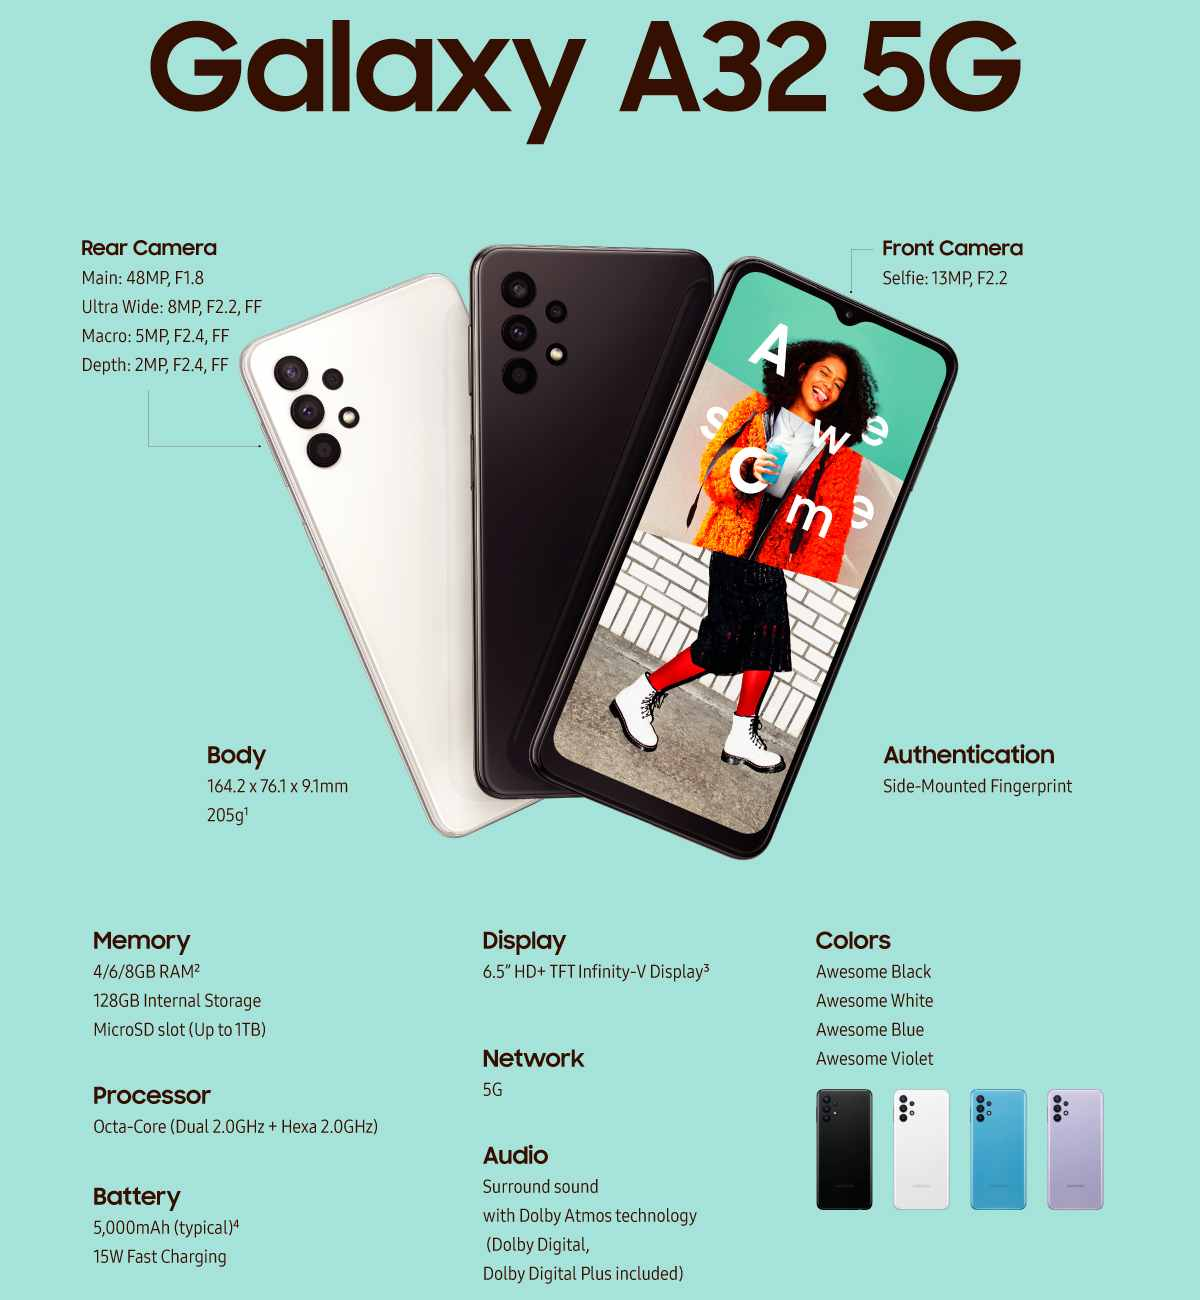 مواصفات سامسونج Galaxy A32 5G